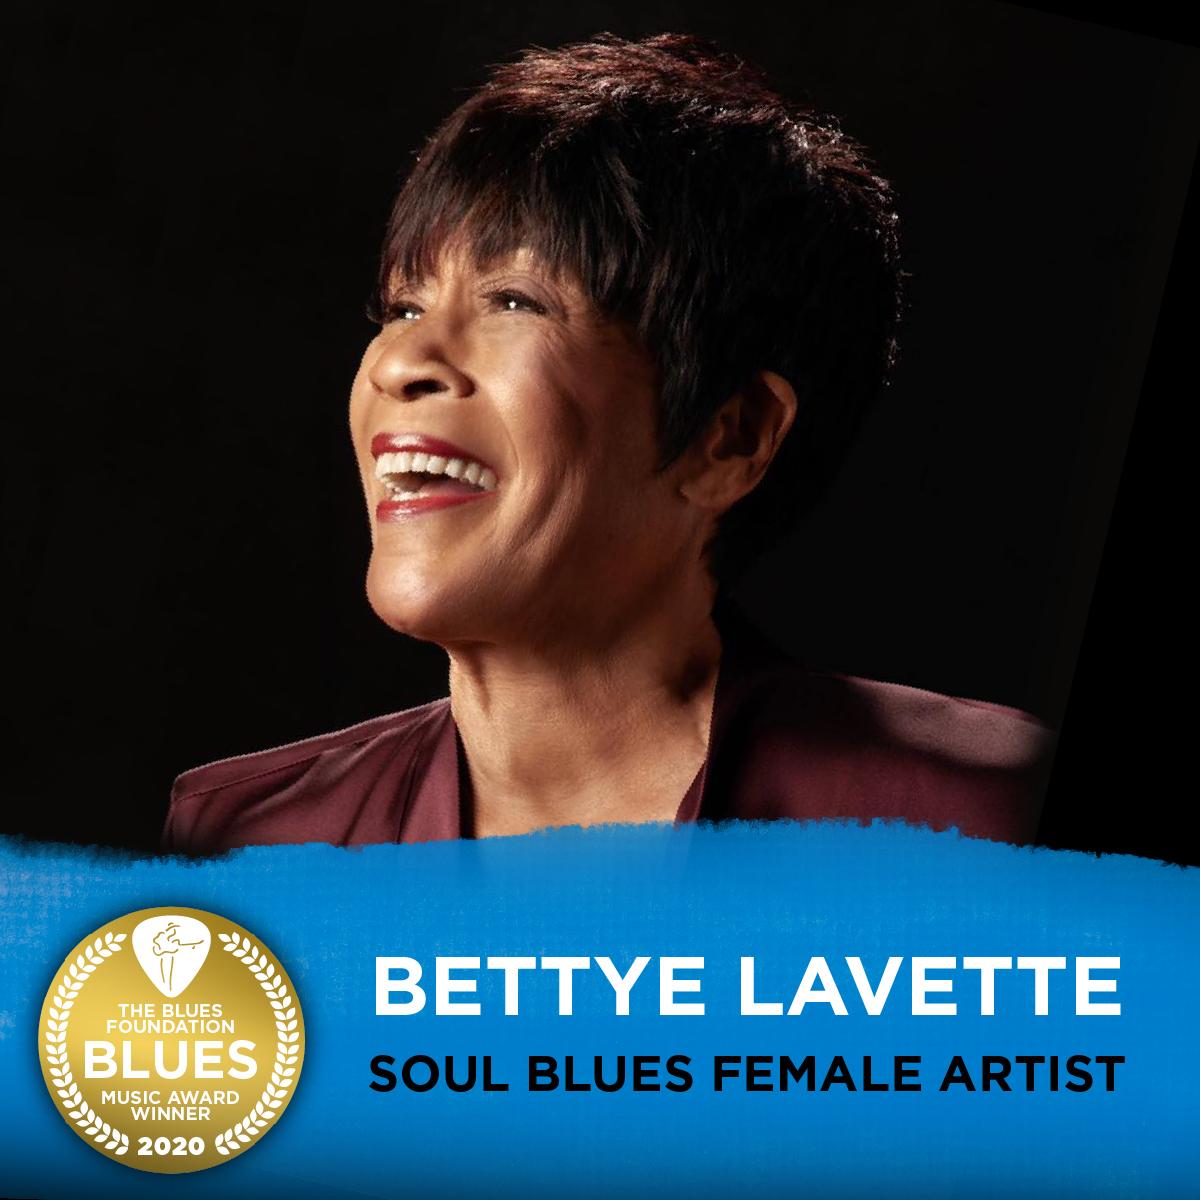 image of bettye lavette bma winner 2020